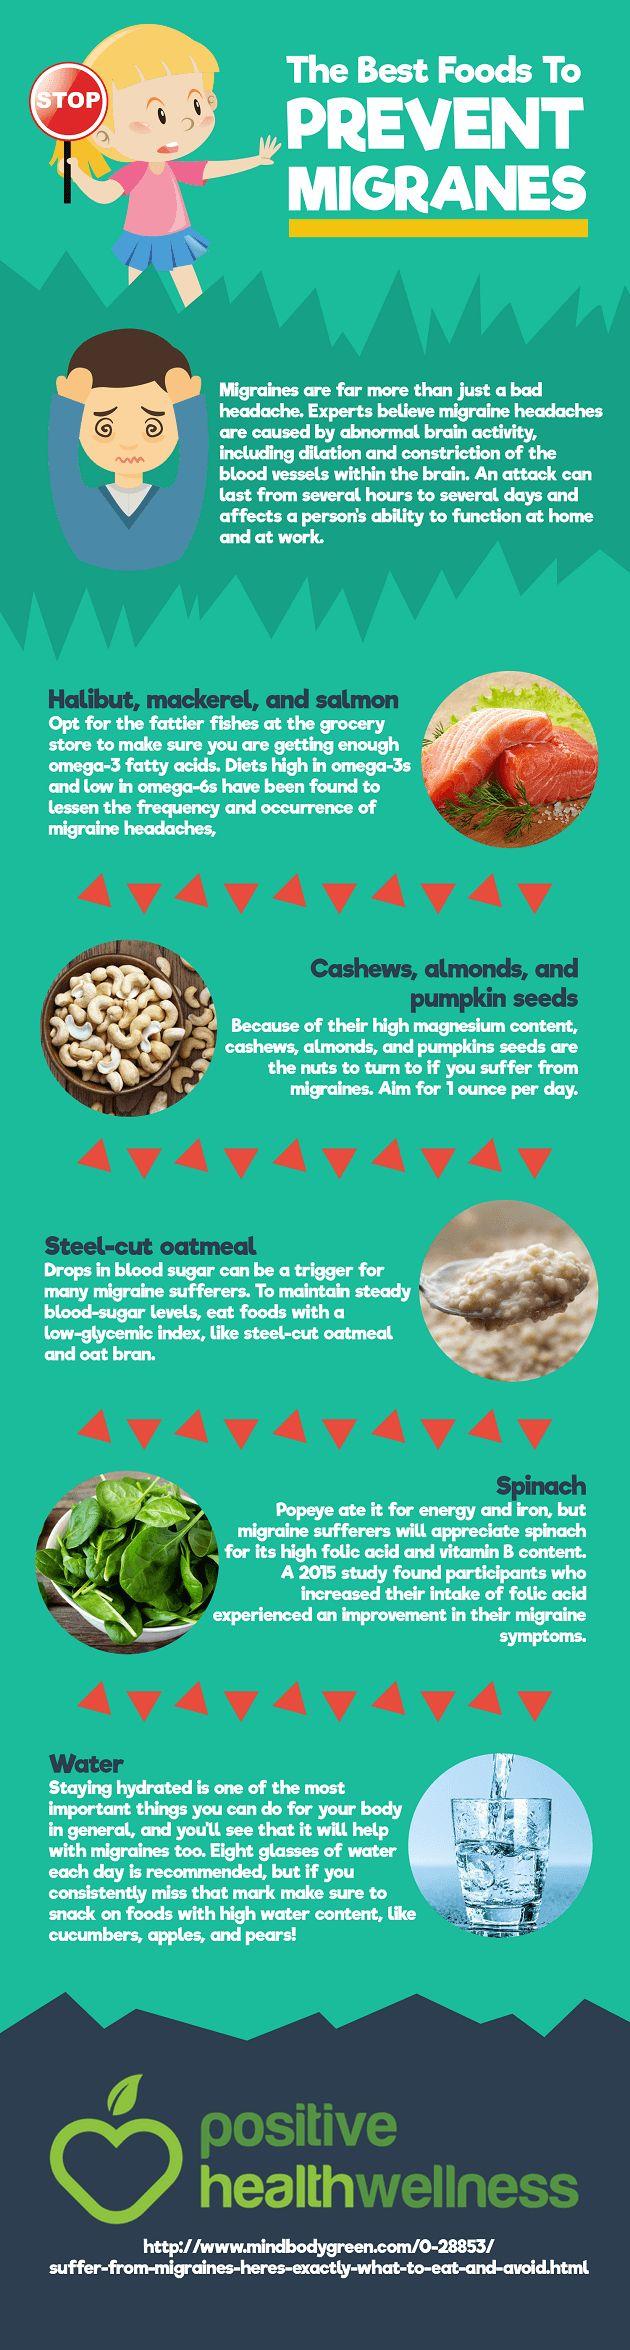 The Best Foods to Prevent MigrainesIntan RBTj